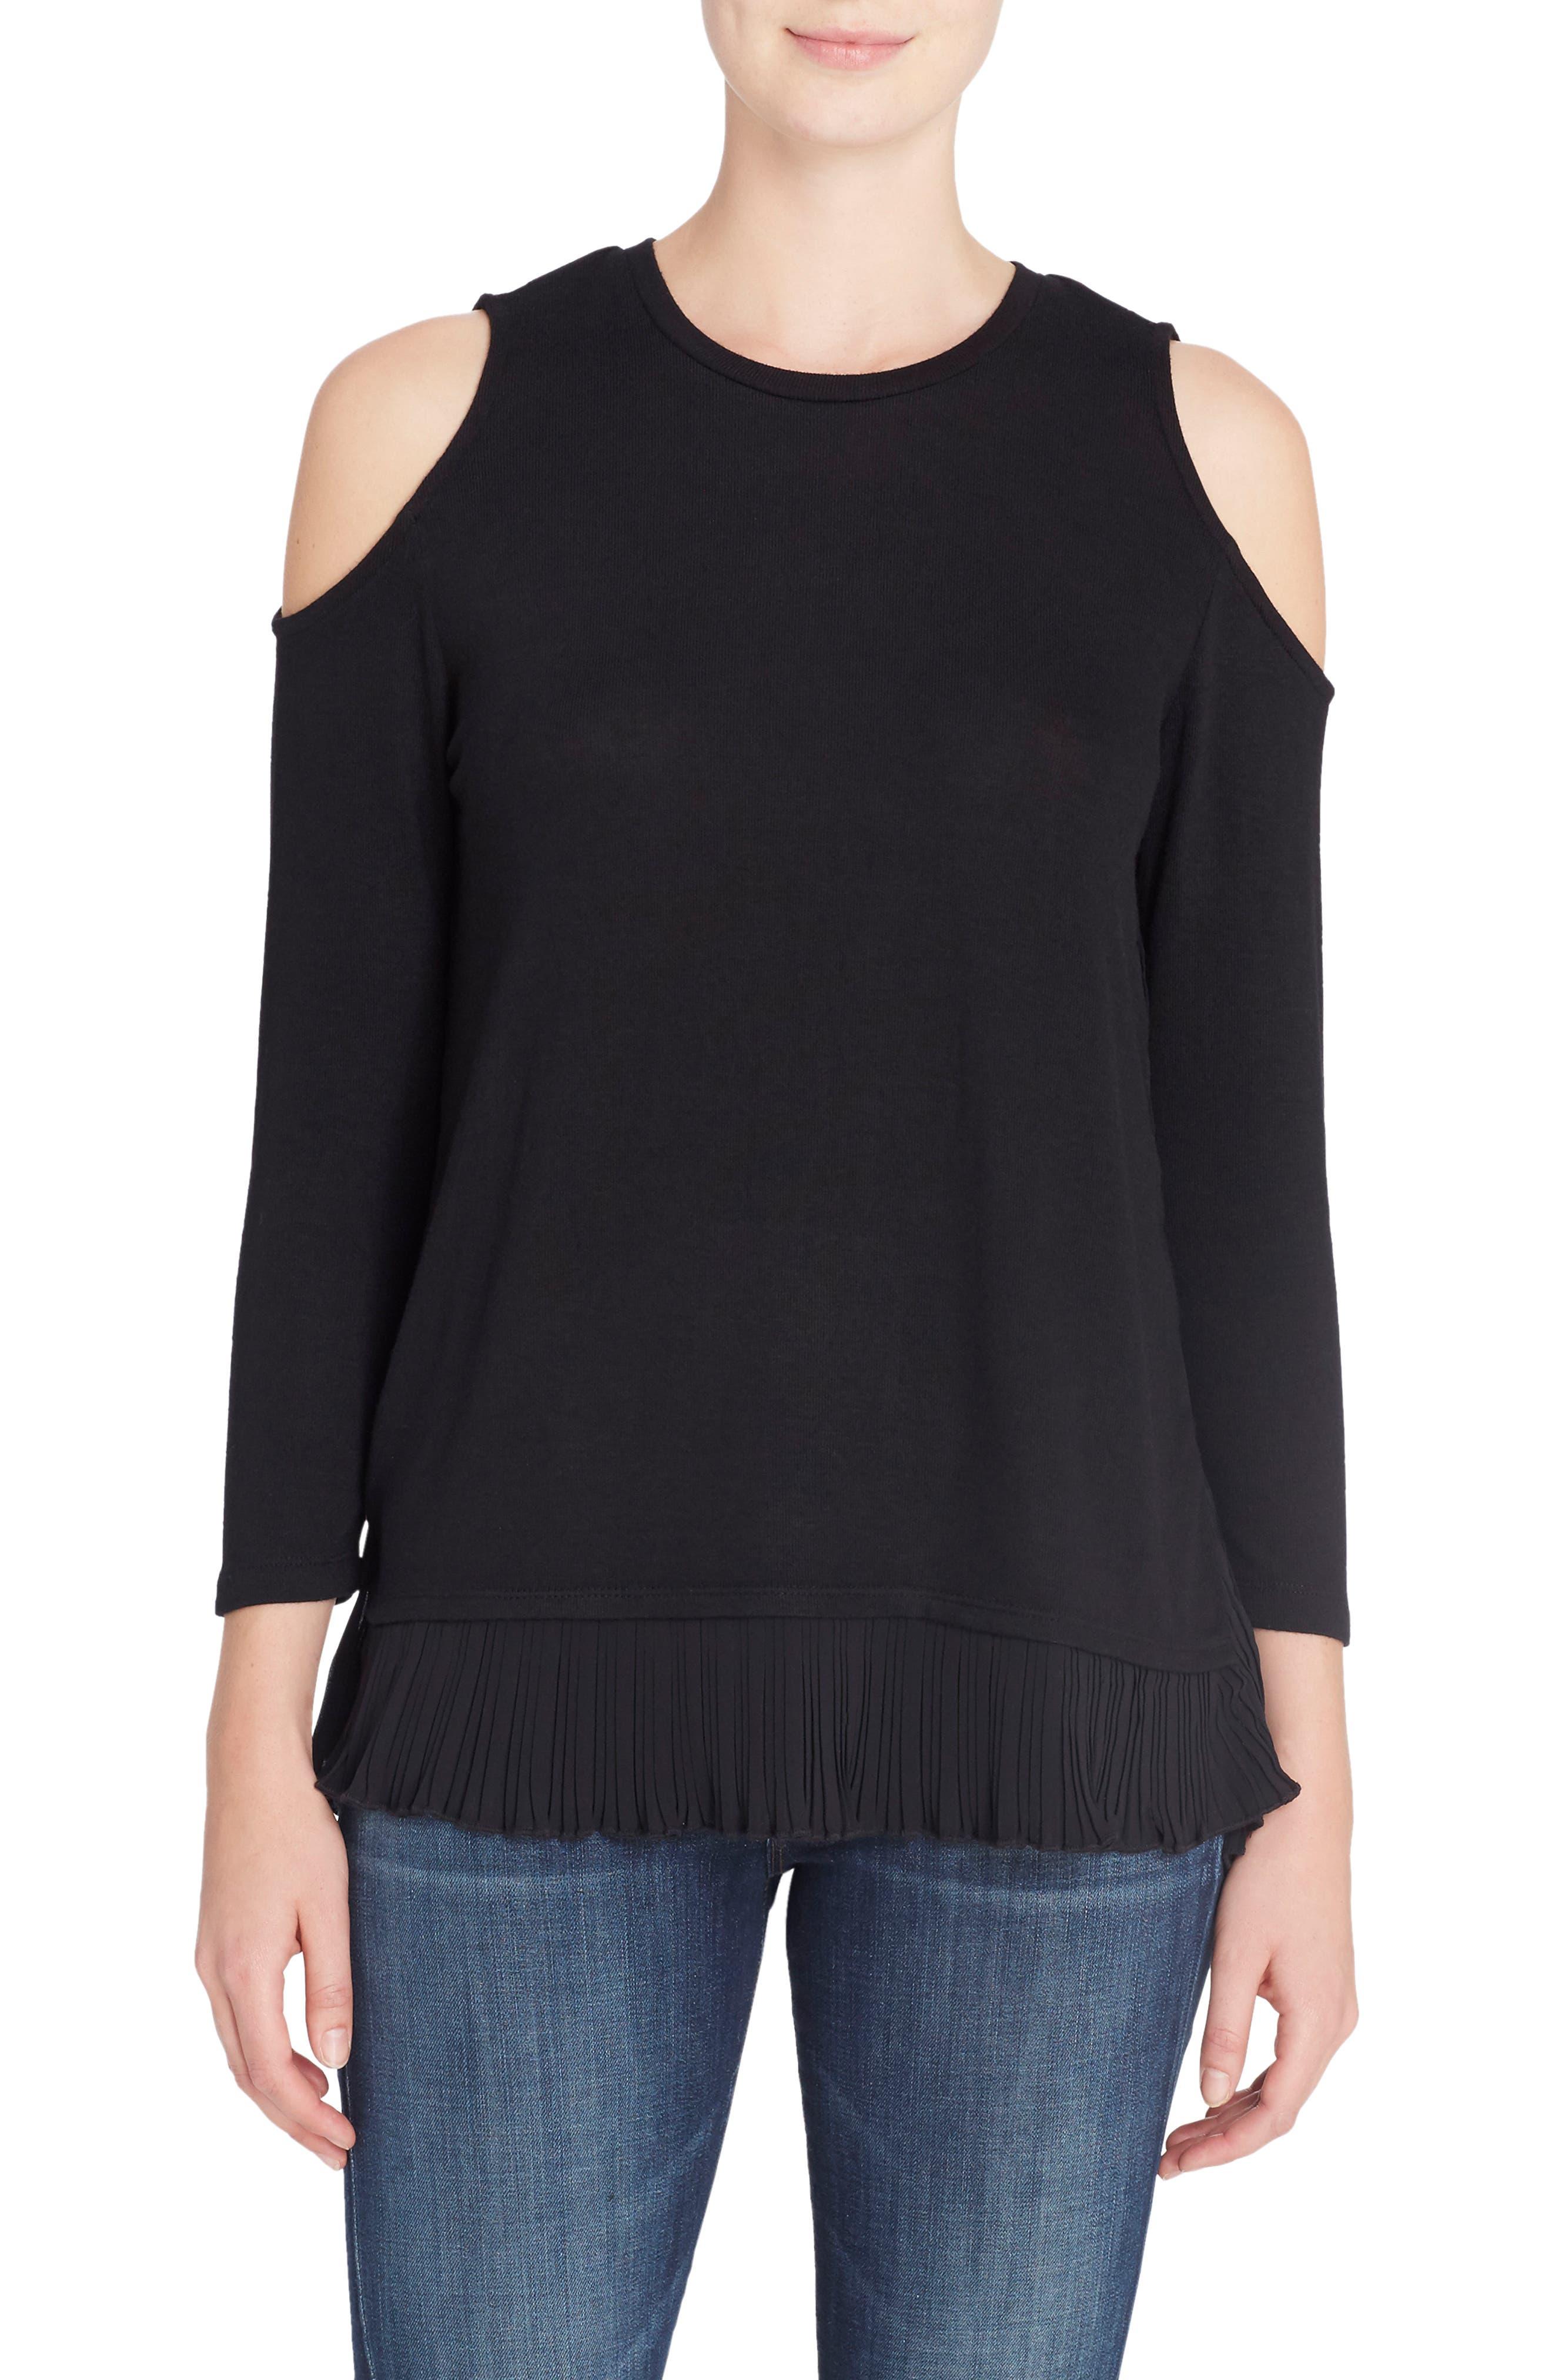 Linda Mixed Media Cold Shoulder Sweater,                         Main,                         color, 010